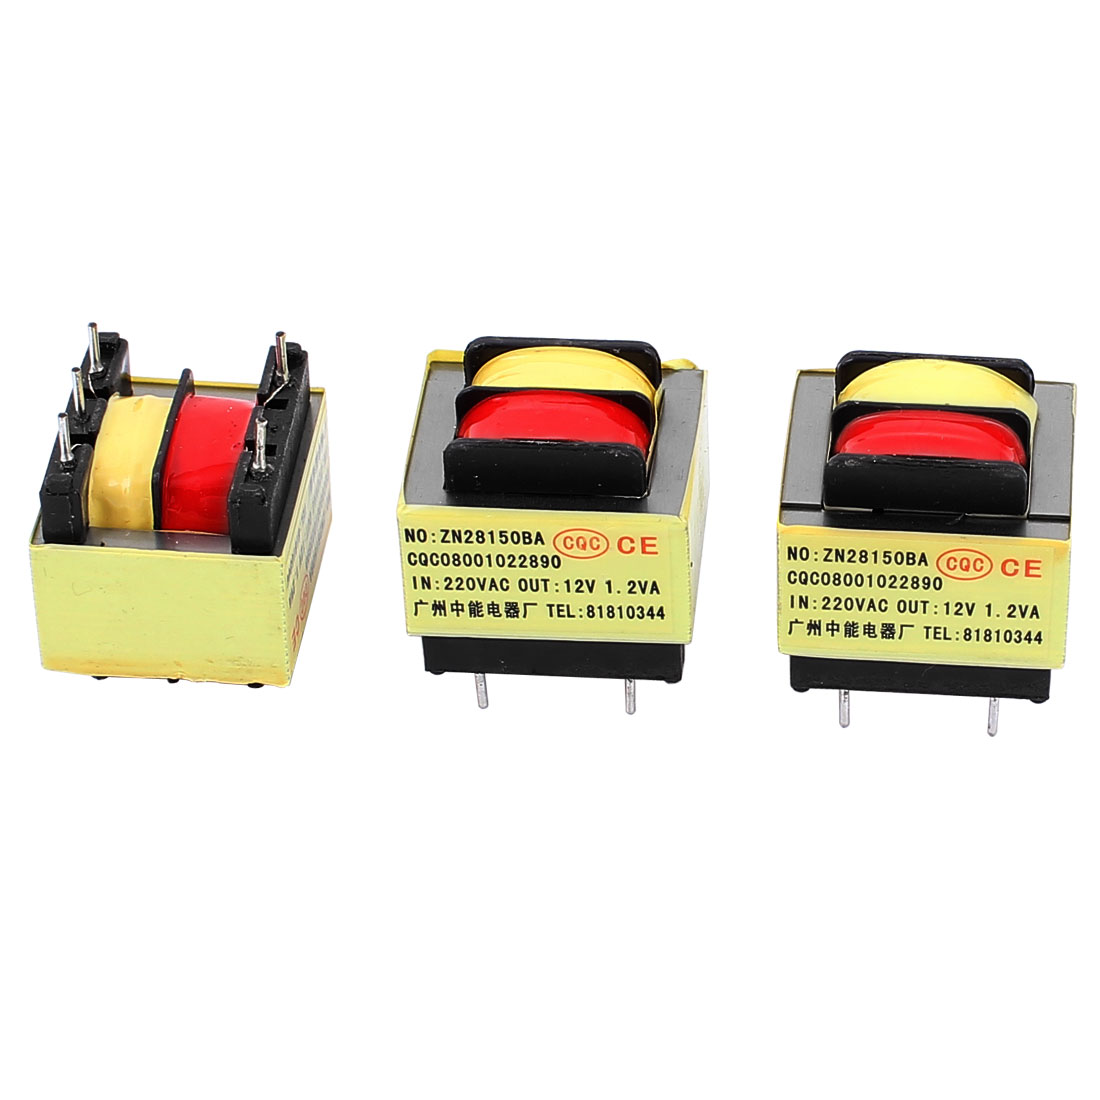 3Pcs 220V Input 12V 1.2W Output Yellow Red Ferrite Core Power Transformer w 5 Terminals